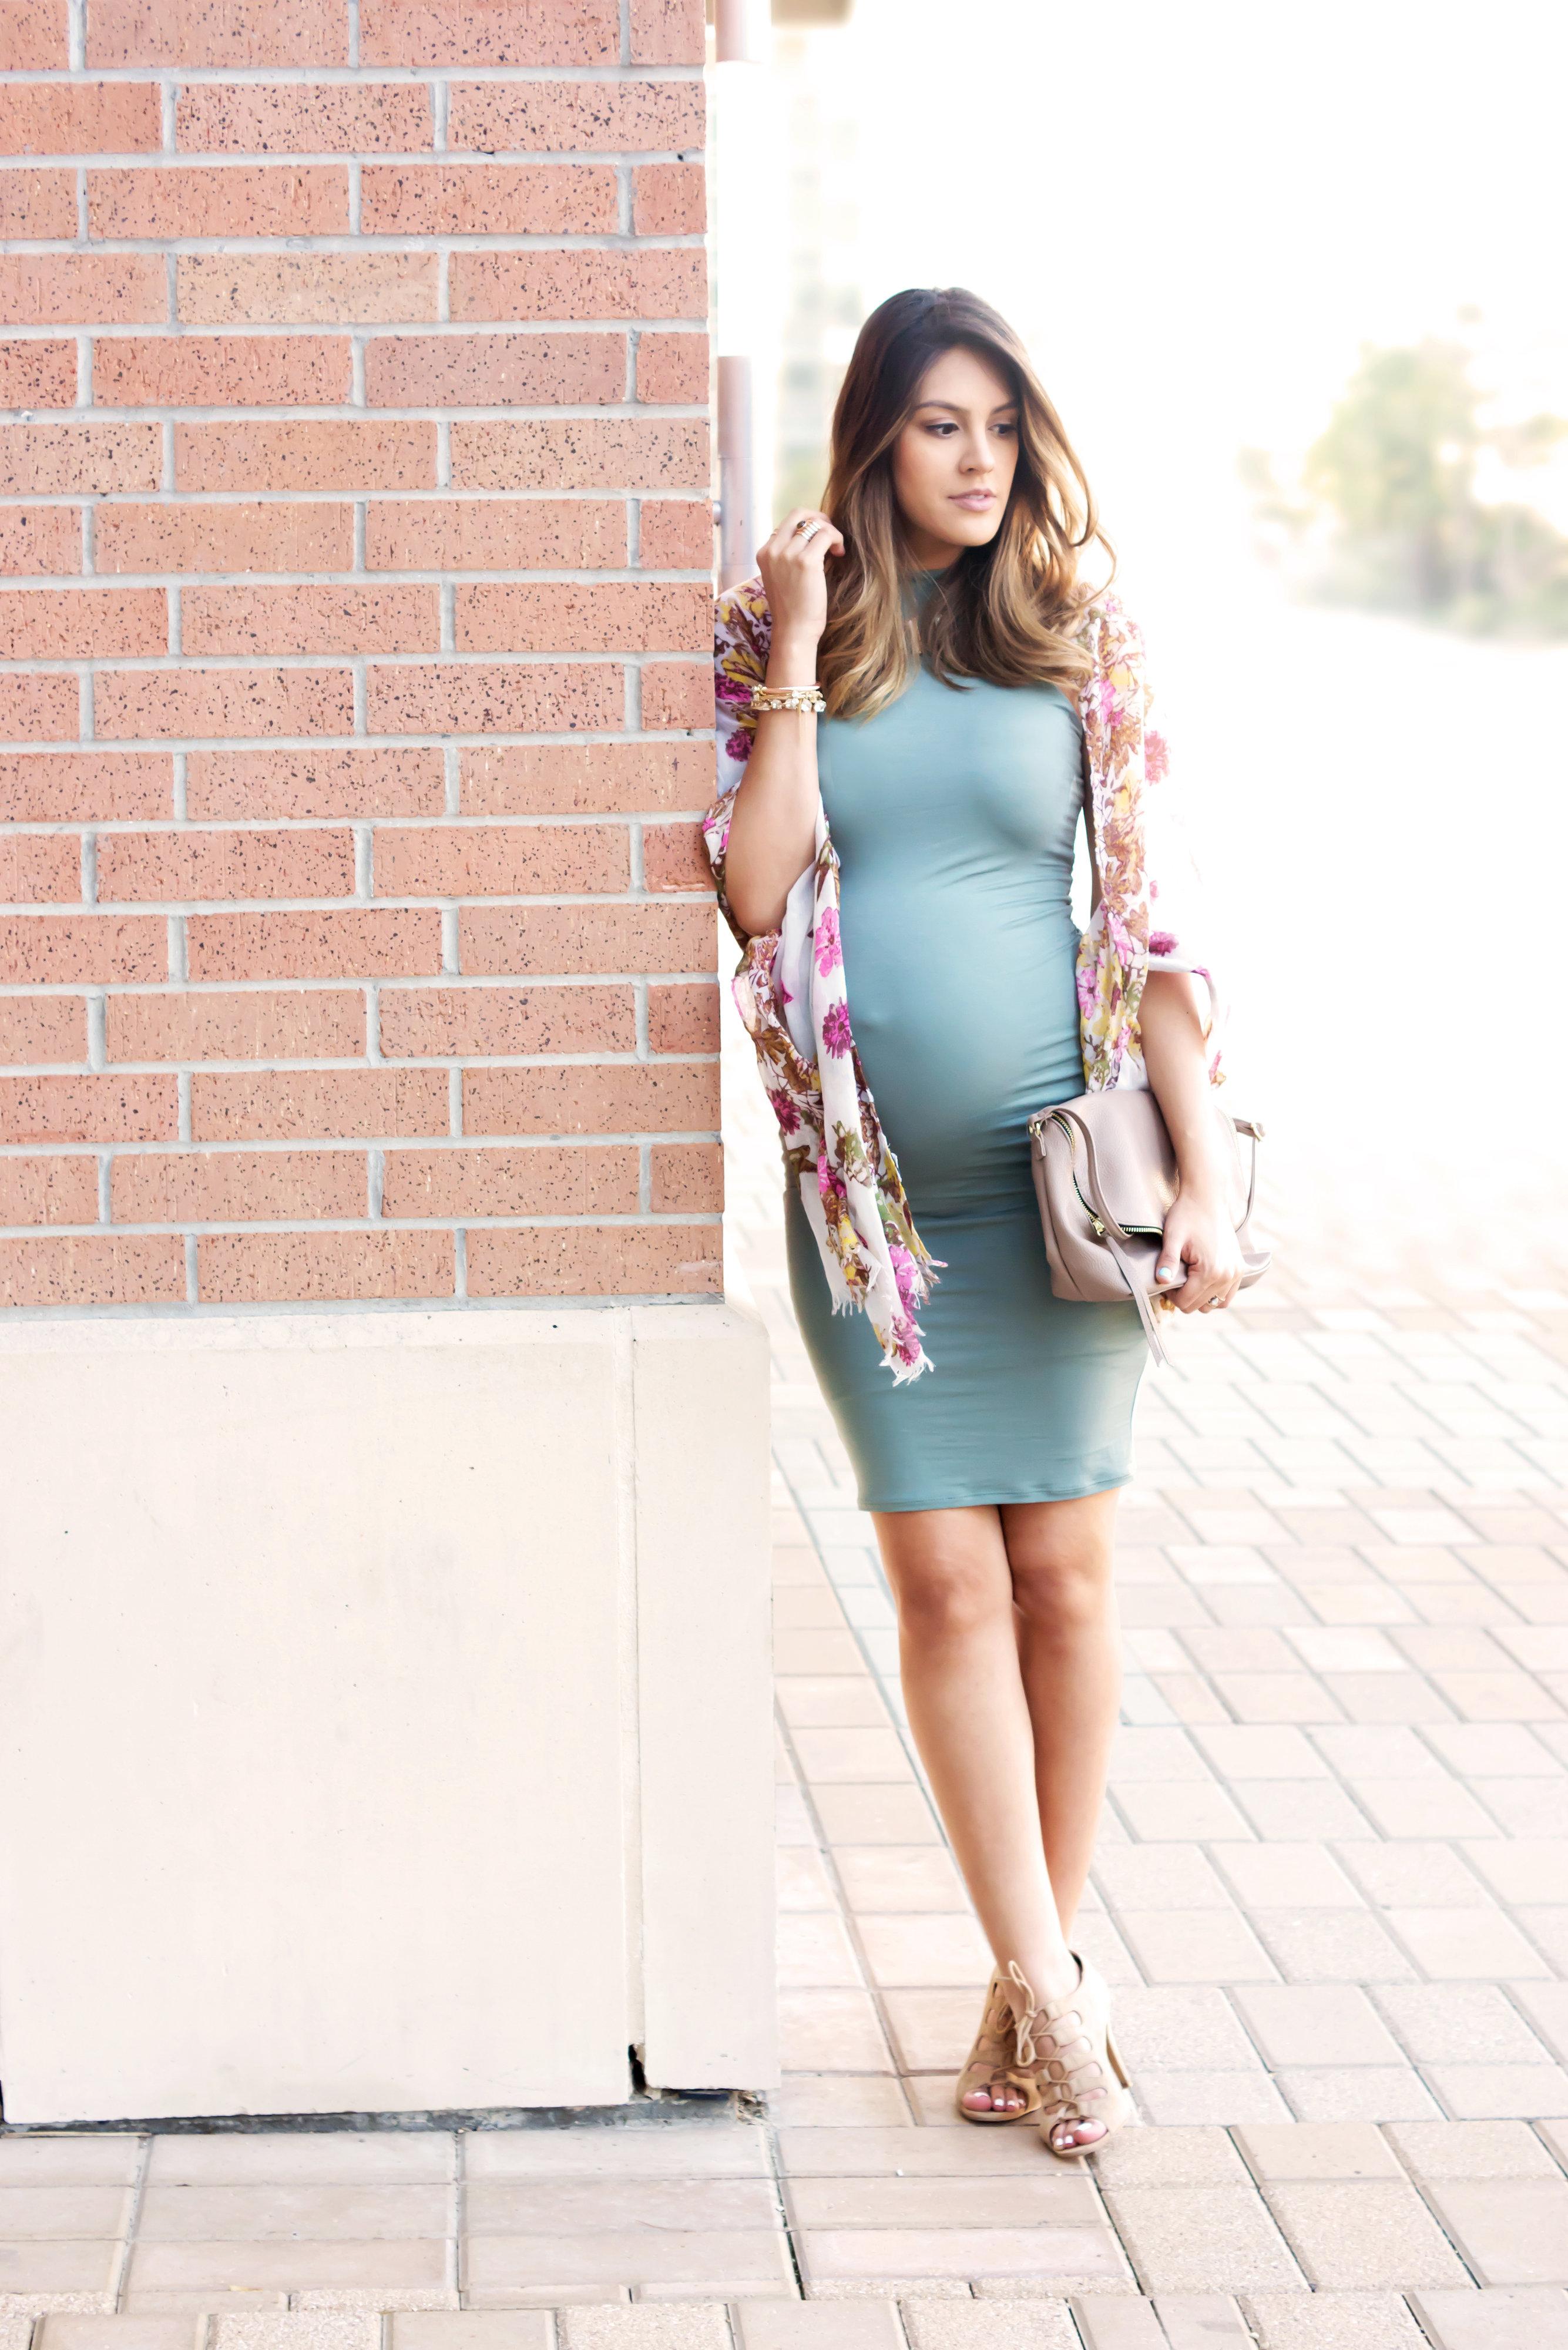 style the girl bodycon dress